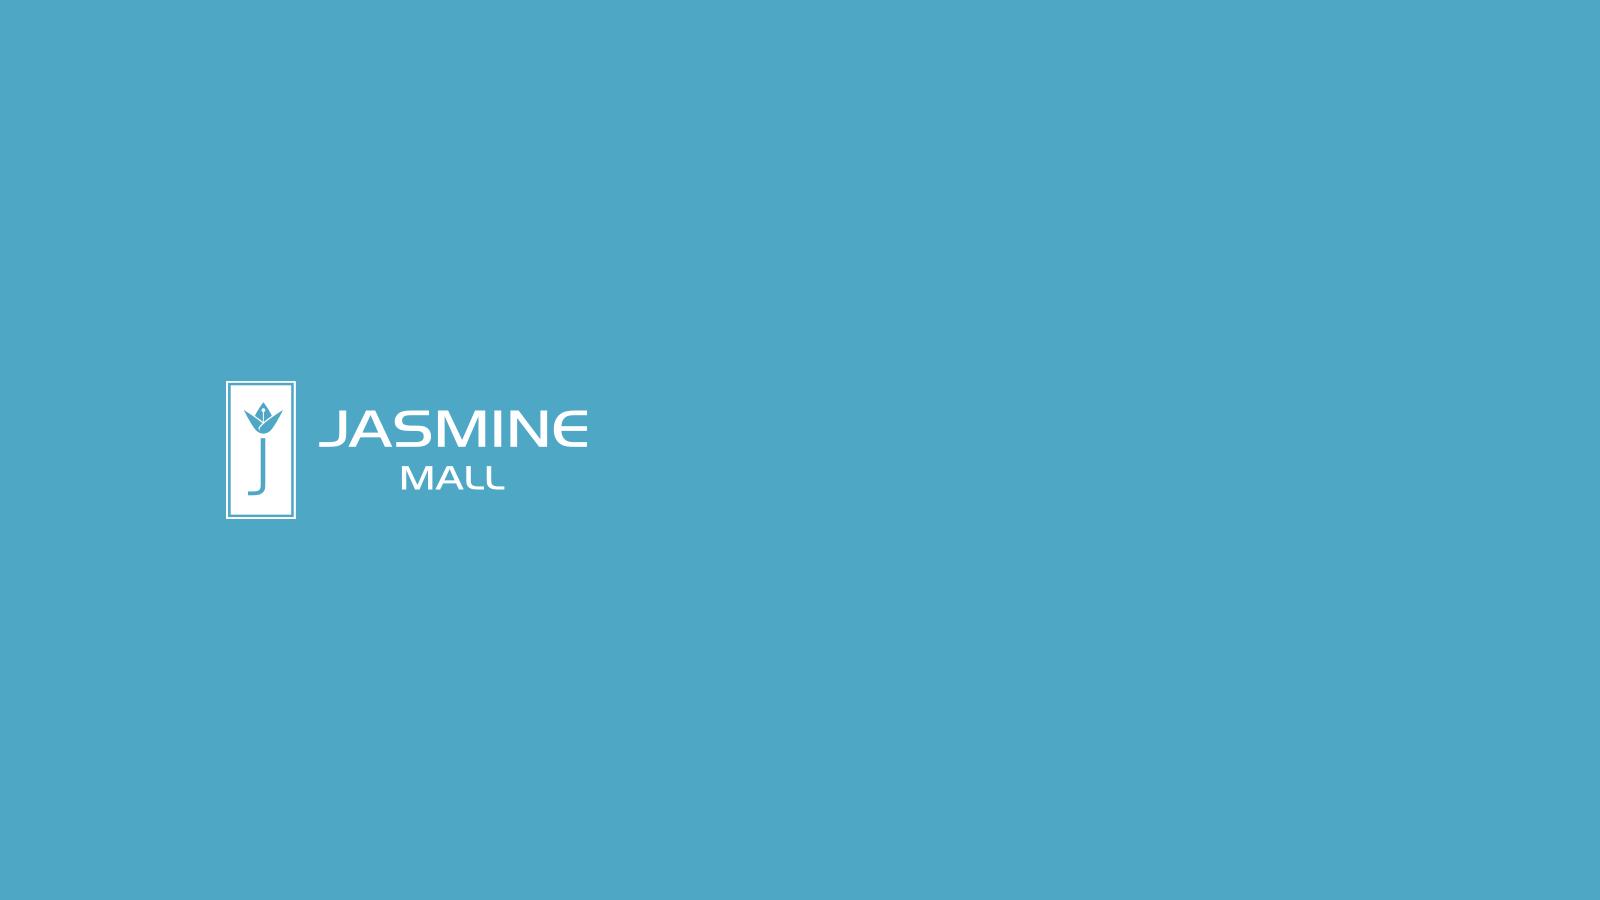 graphic-brand-design-web-designer-hiline-lahore-pakistan-jasmine-mall-banner